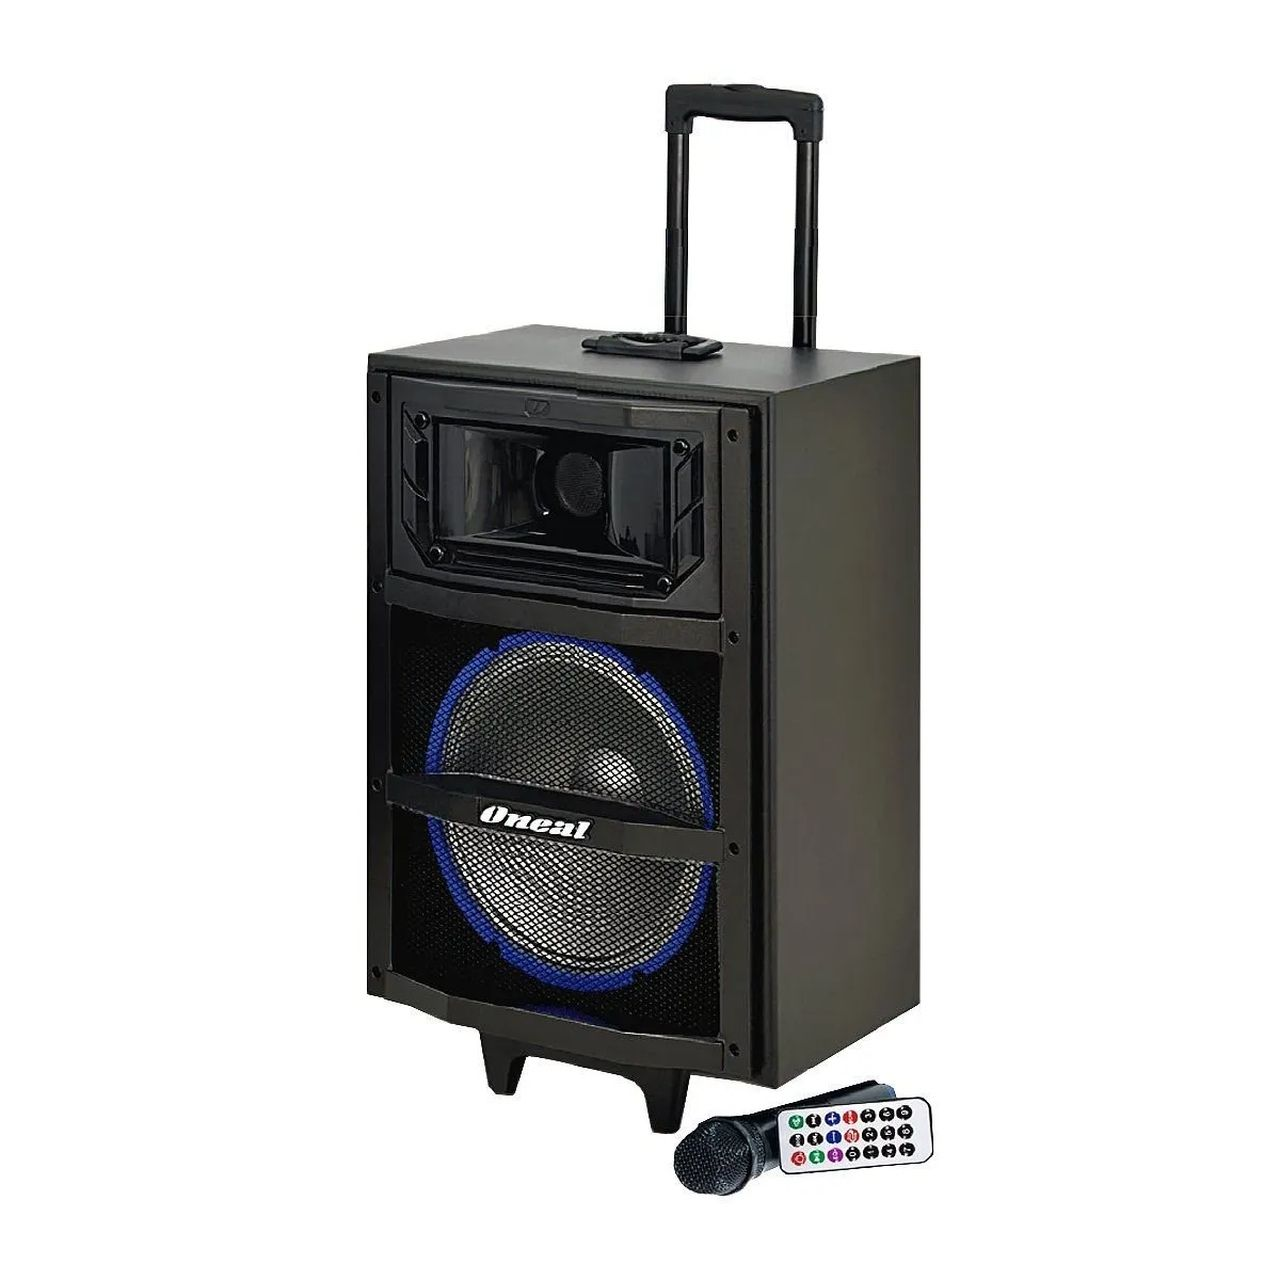 "Caixa Multiuso Ativa Oneal 120W RMS 10"" USB e Bluetooth OCM3910MH"